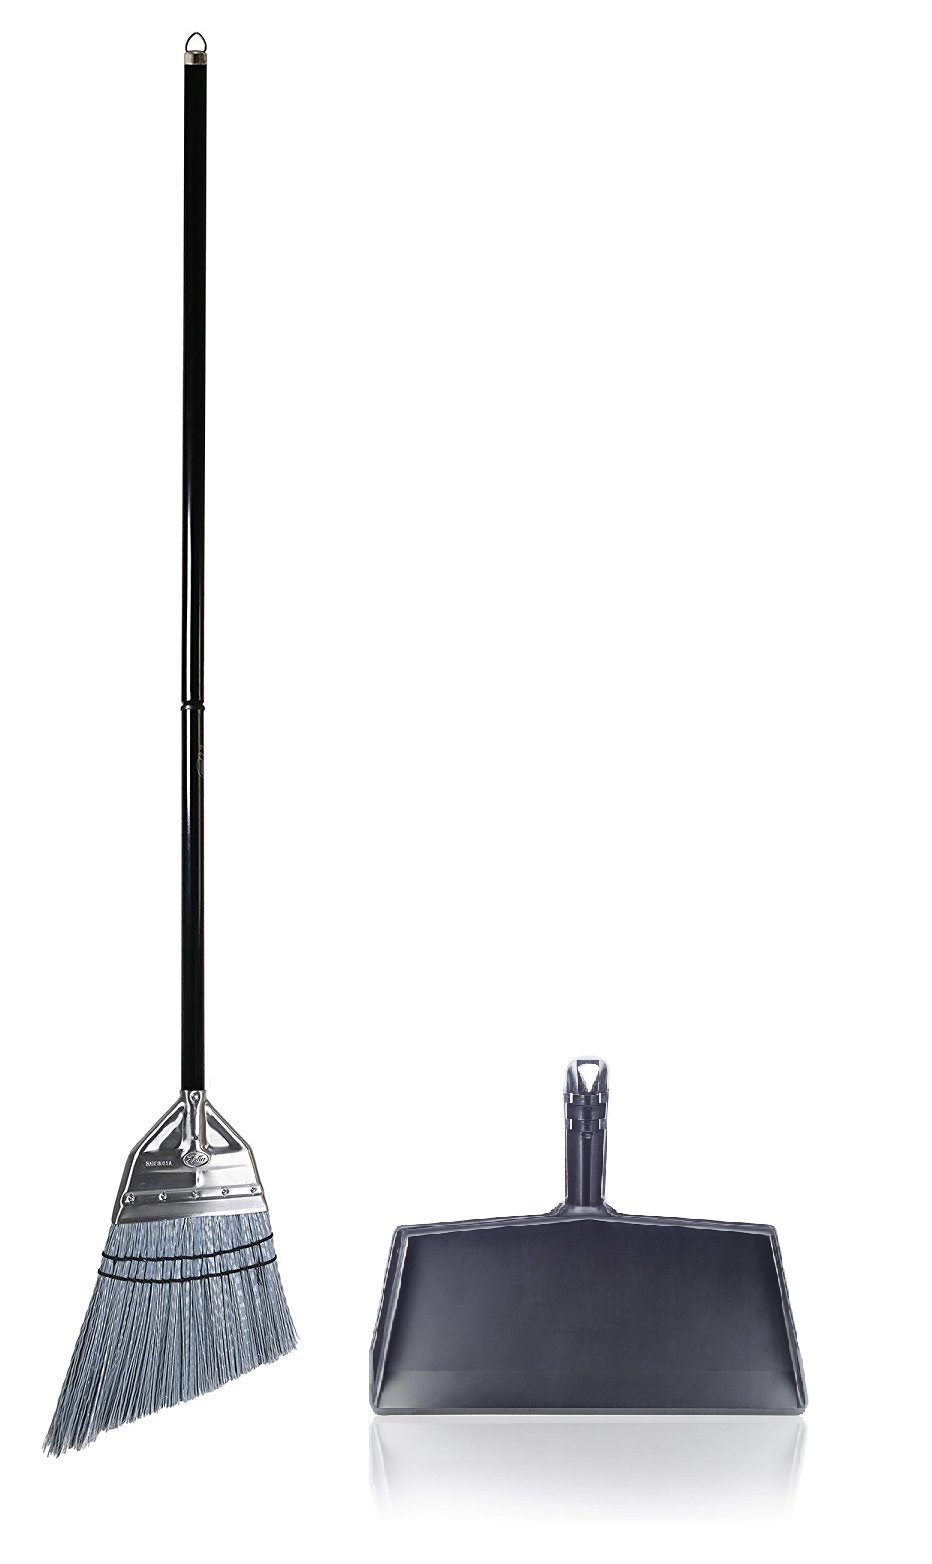 Fuller Brush Angle Broom with Clip-On Dustpan by Fuller Brush (Image #1)